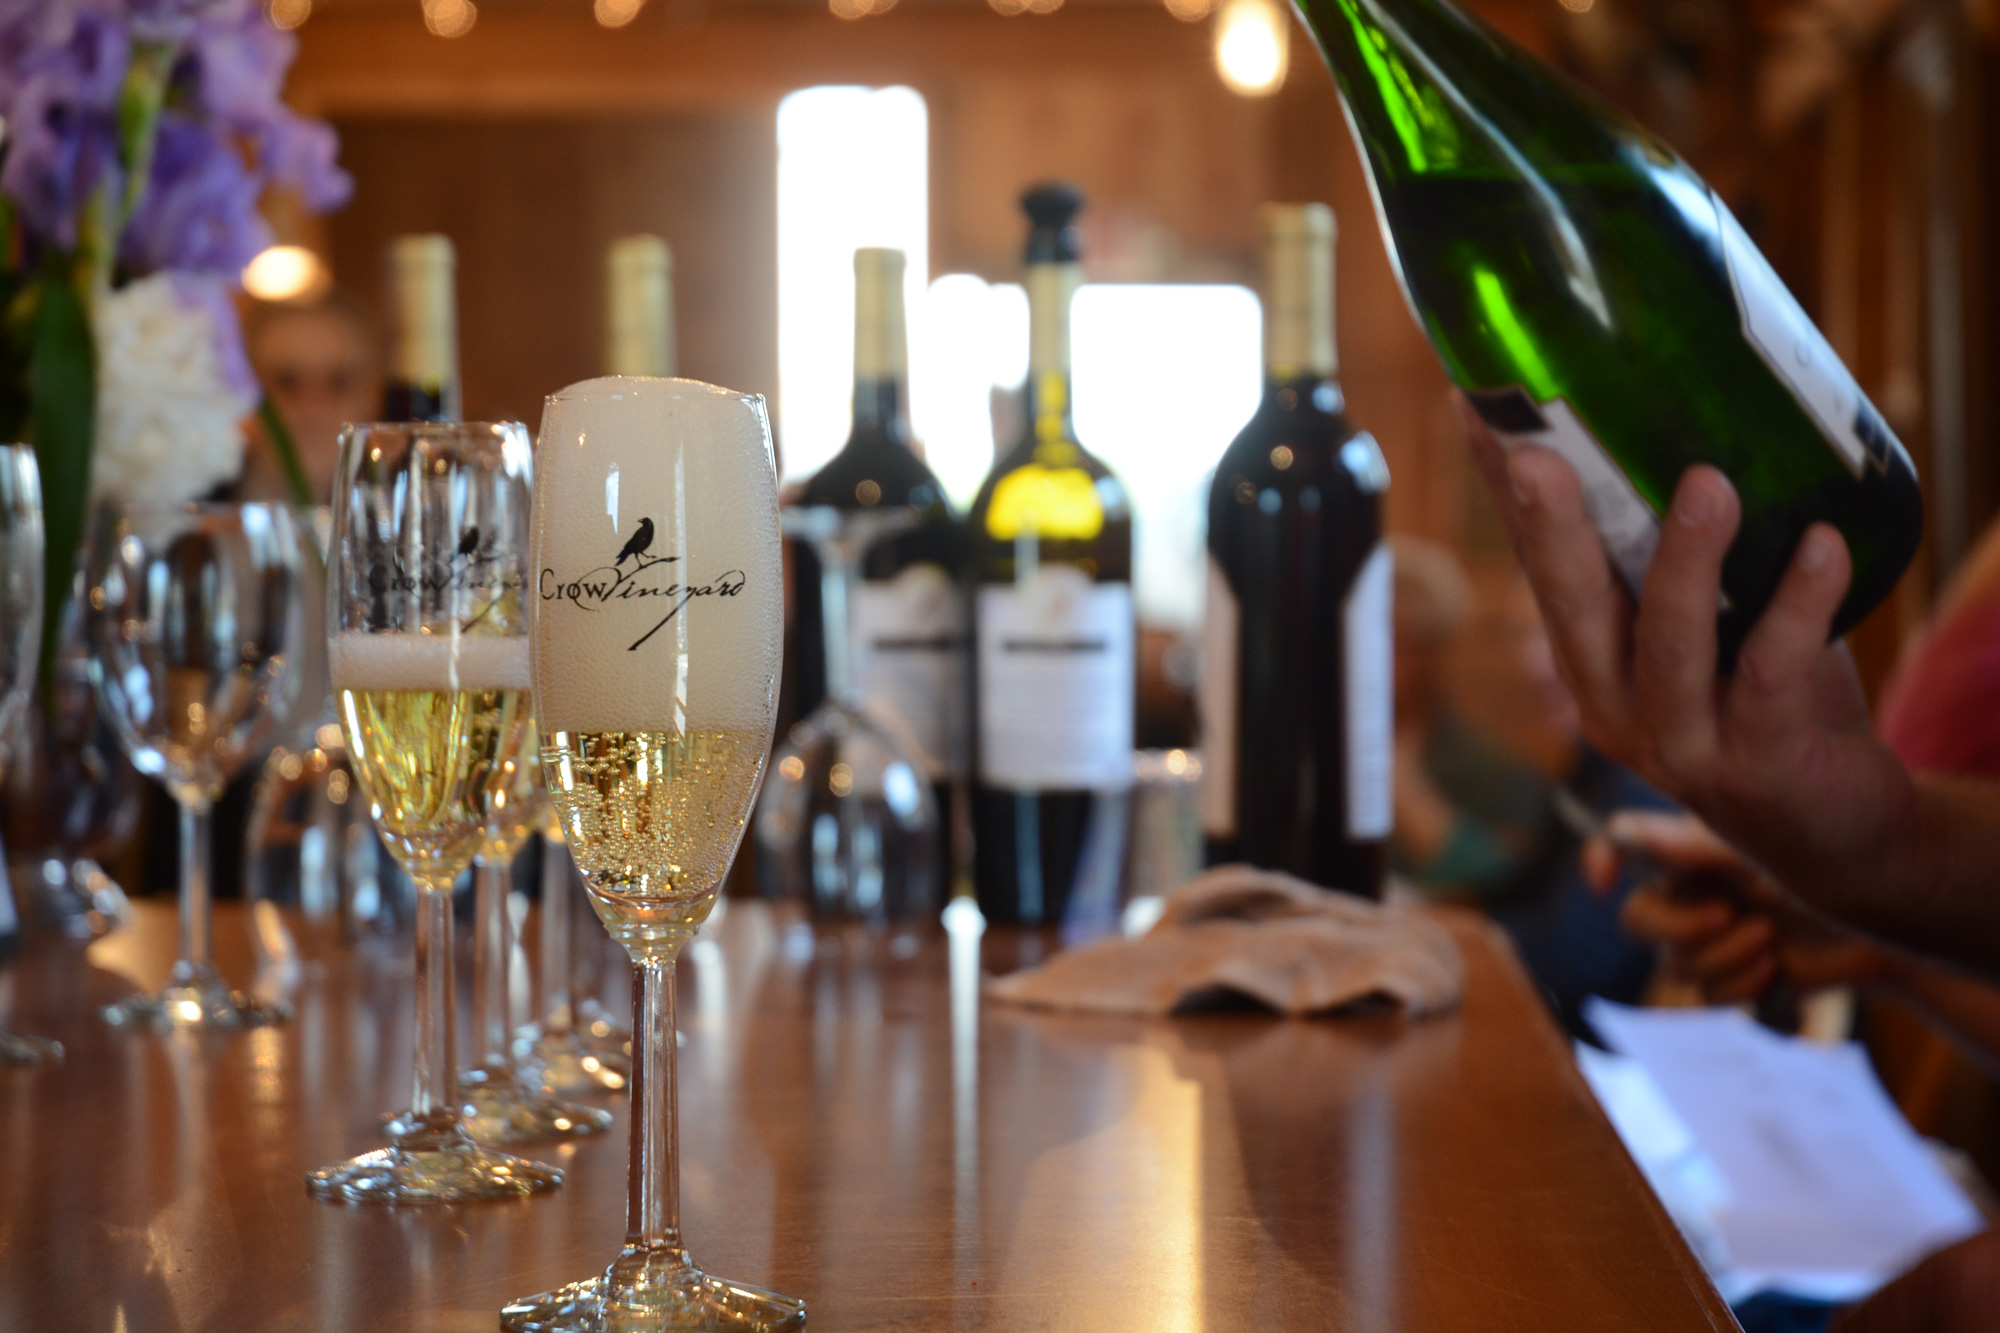 Crow Vineyard & Winery Sparkling Vidal